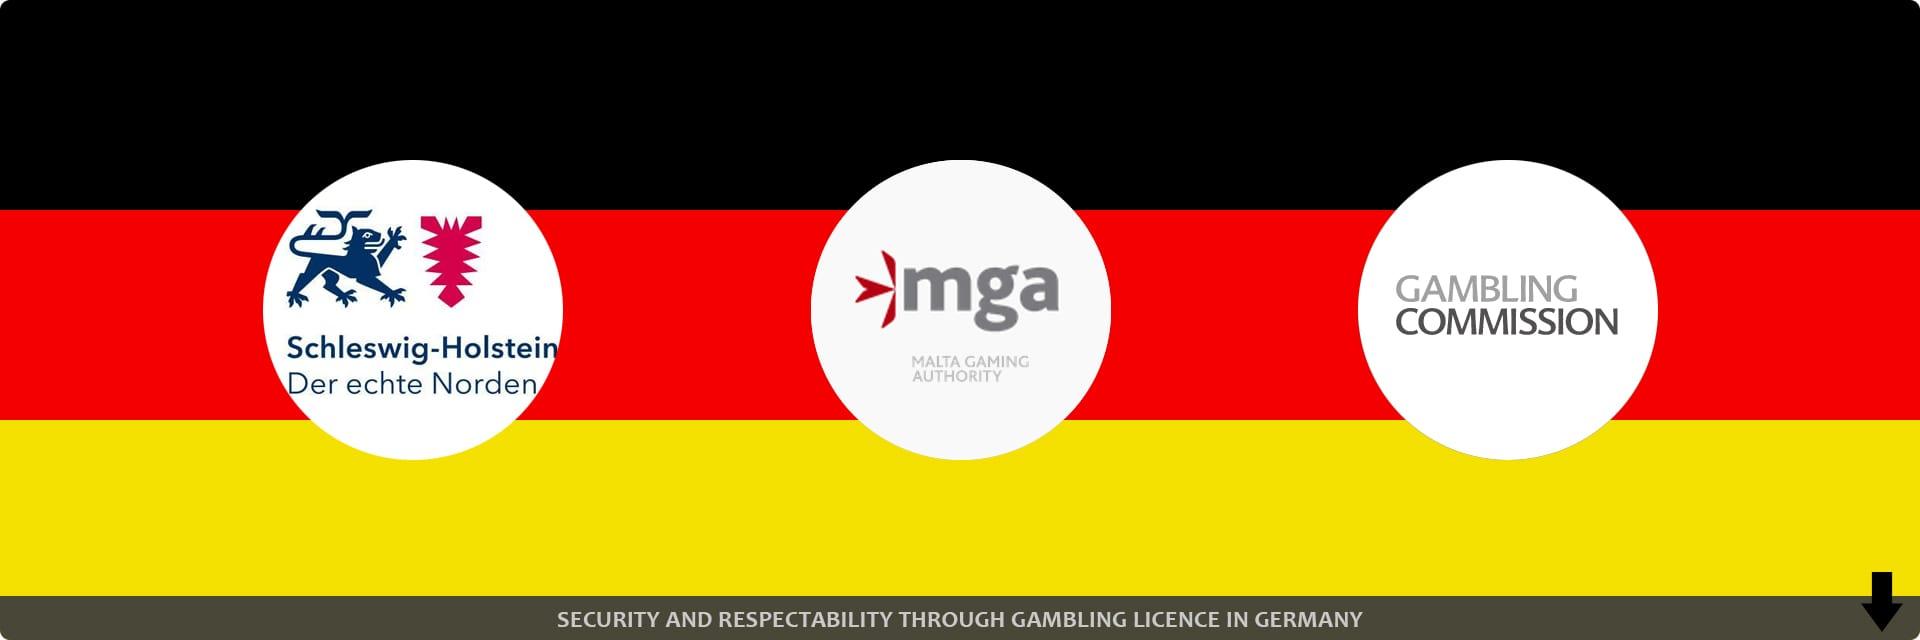 Gambling license in Germany.